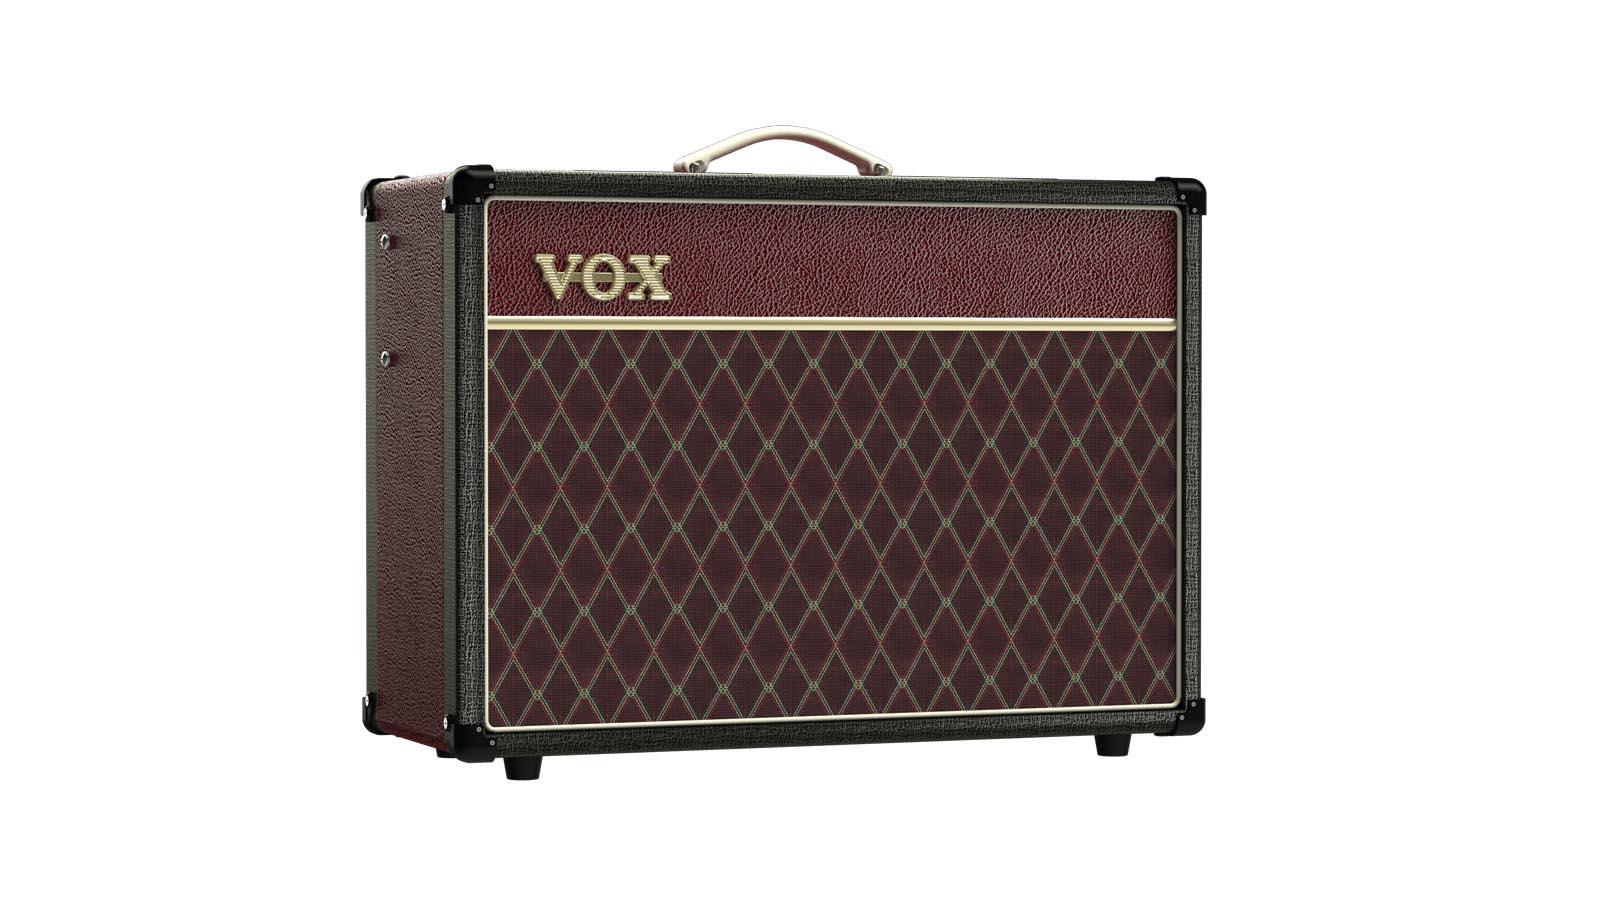 Vox AC15 Custom Serie Ltd. BM 1x12 Gitarrencombo